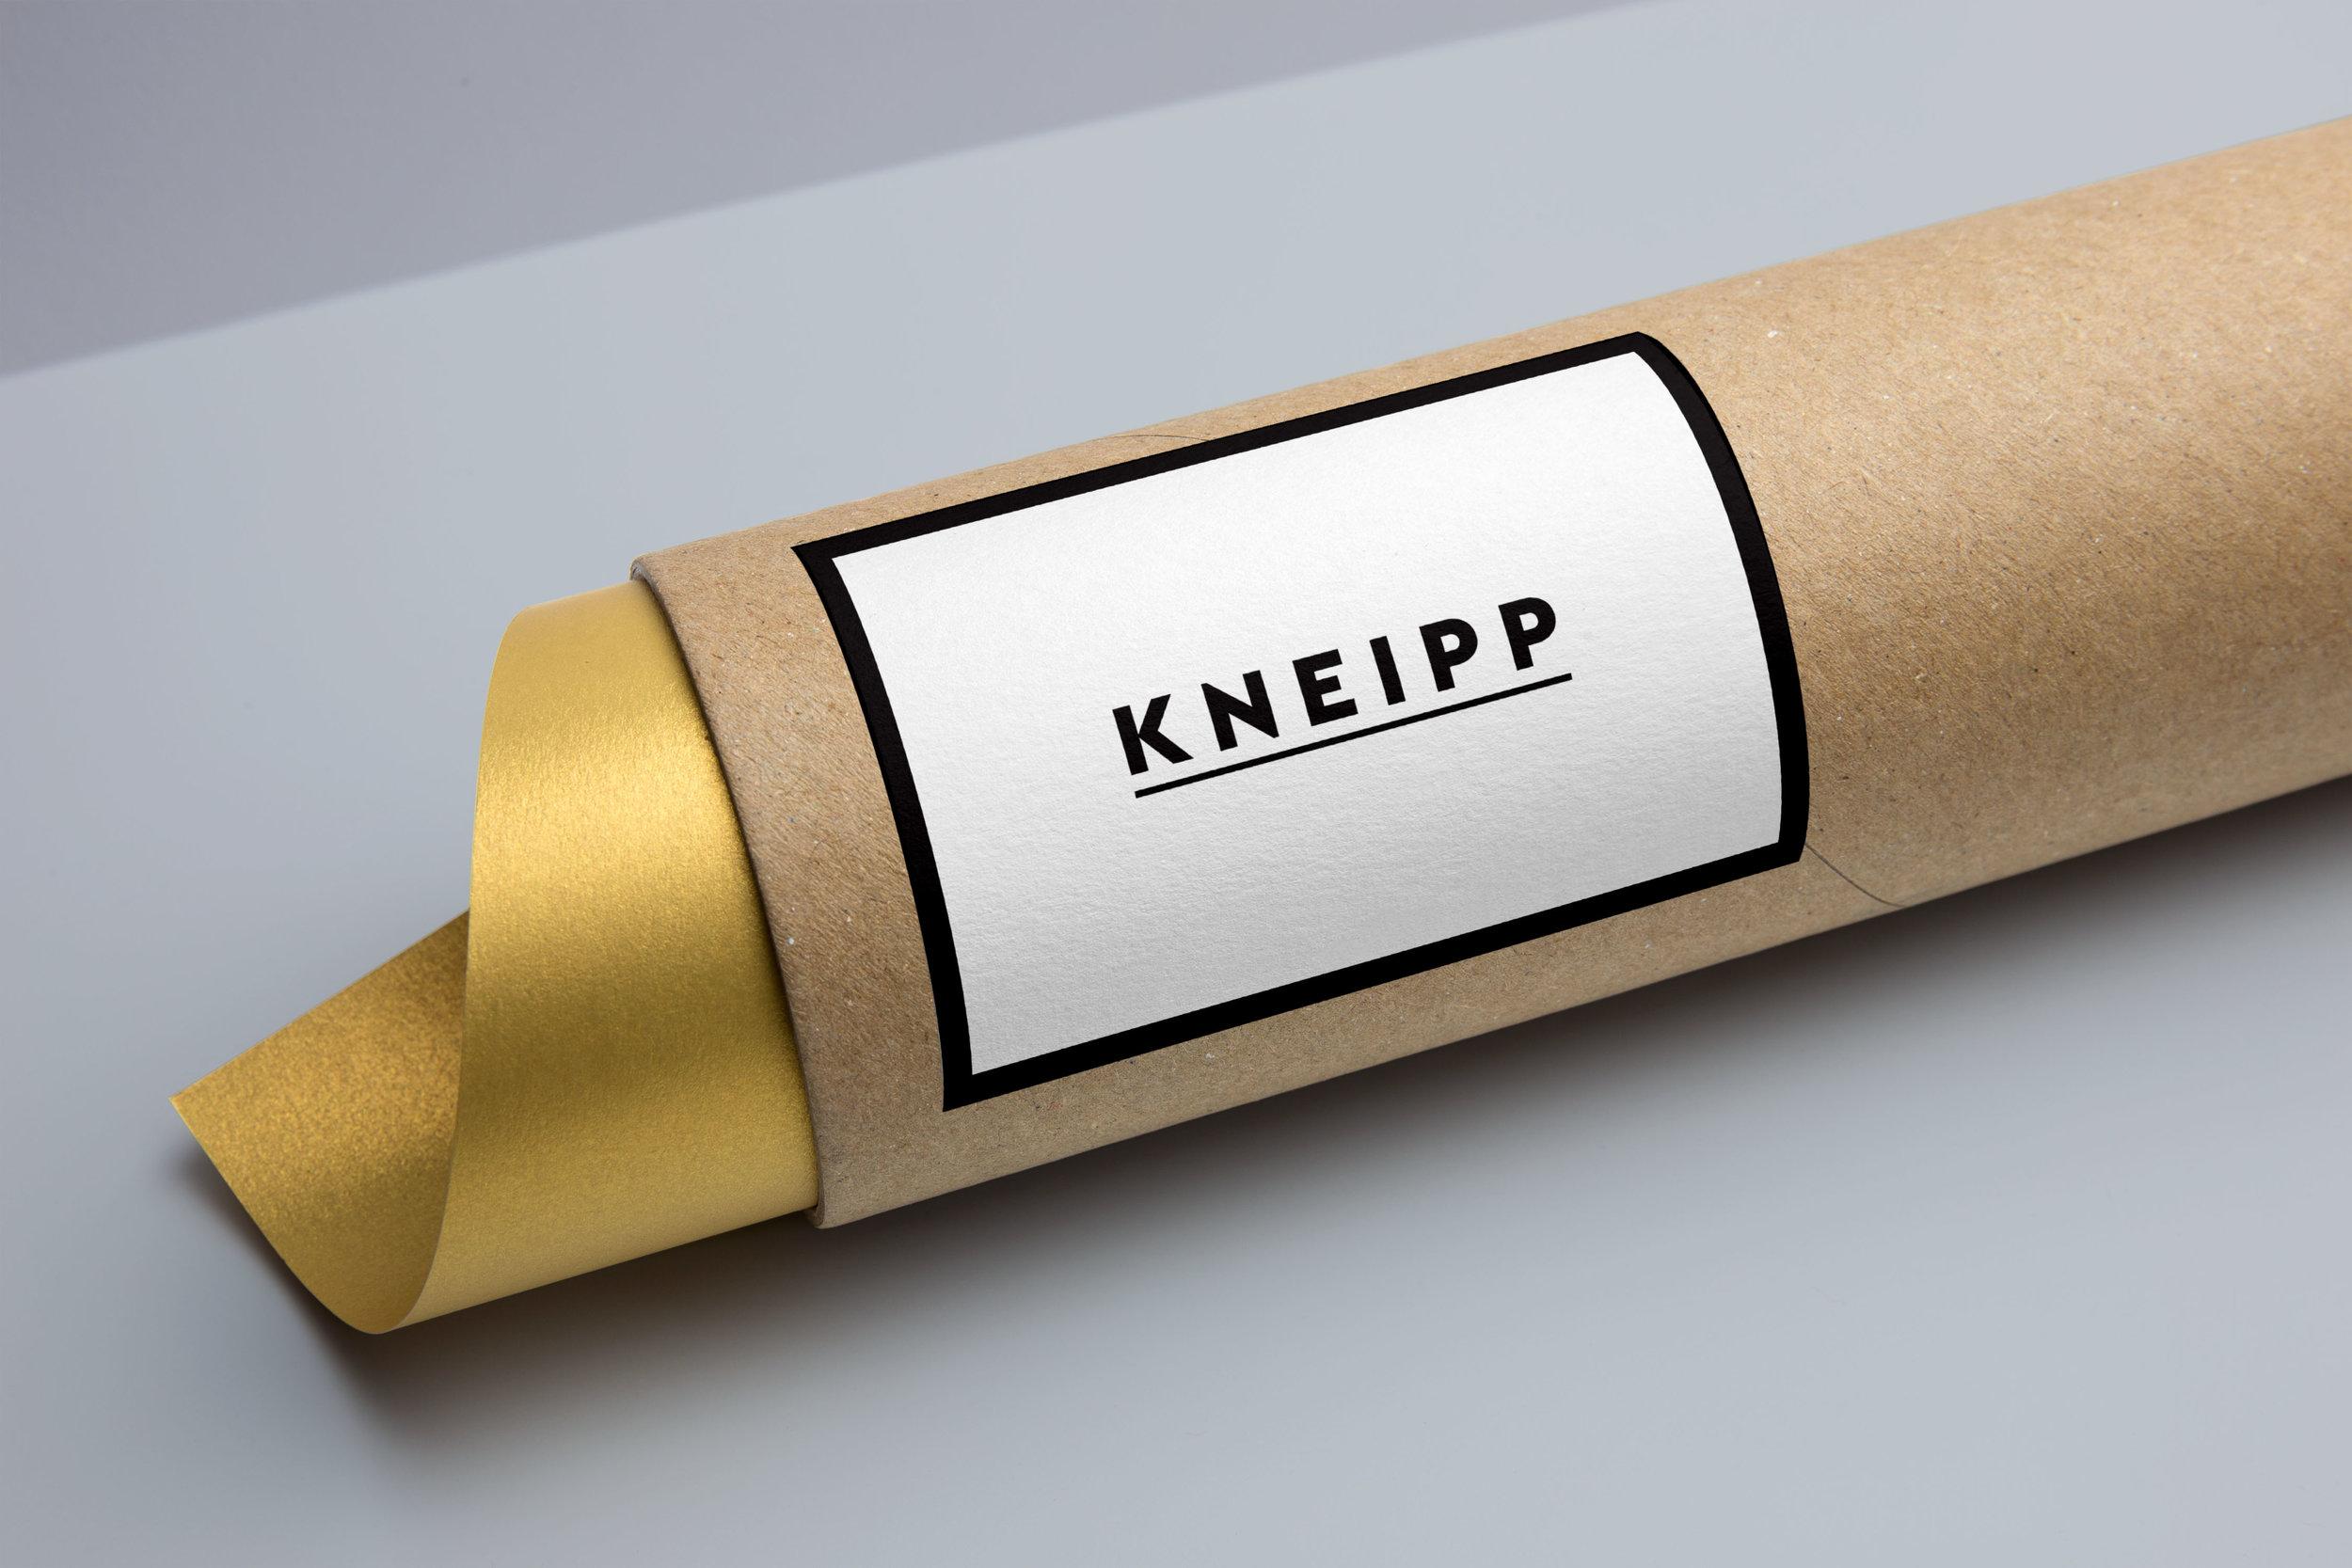 KNEIPP_TUBE_MOCKUP.jpg